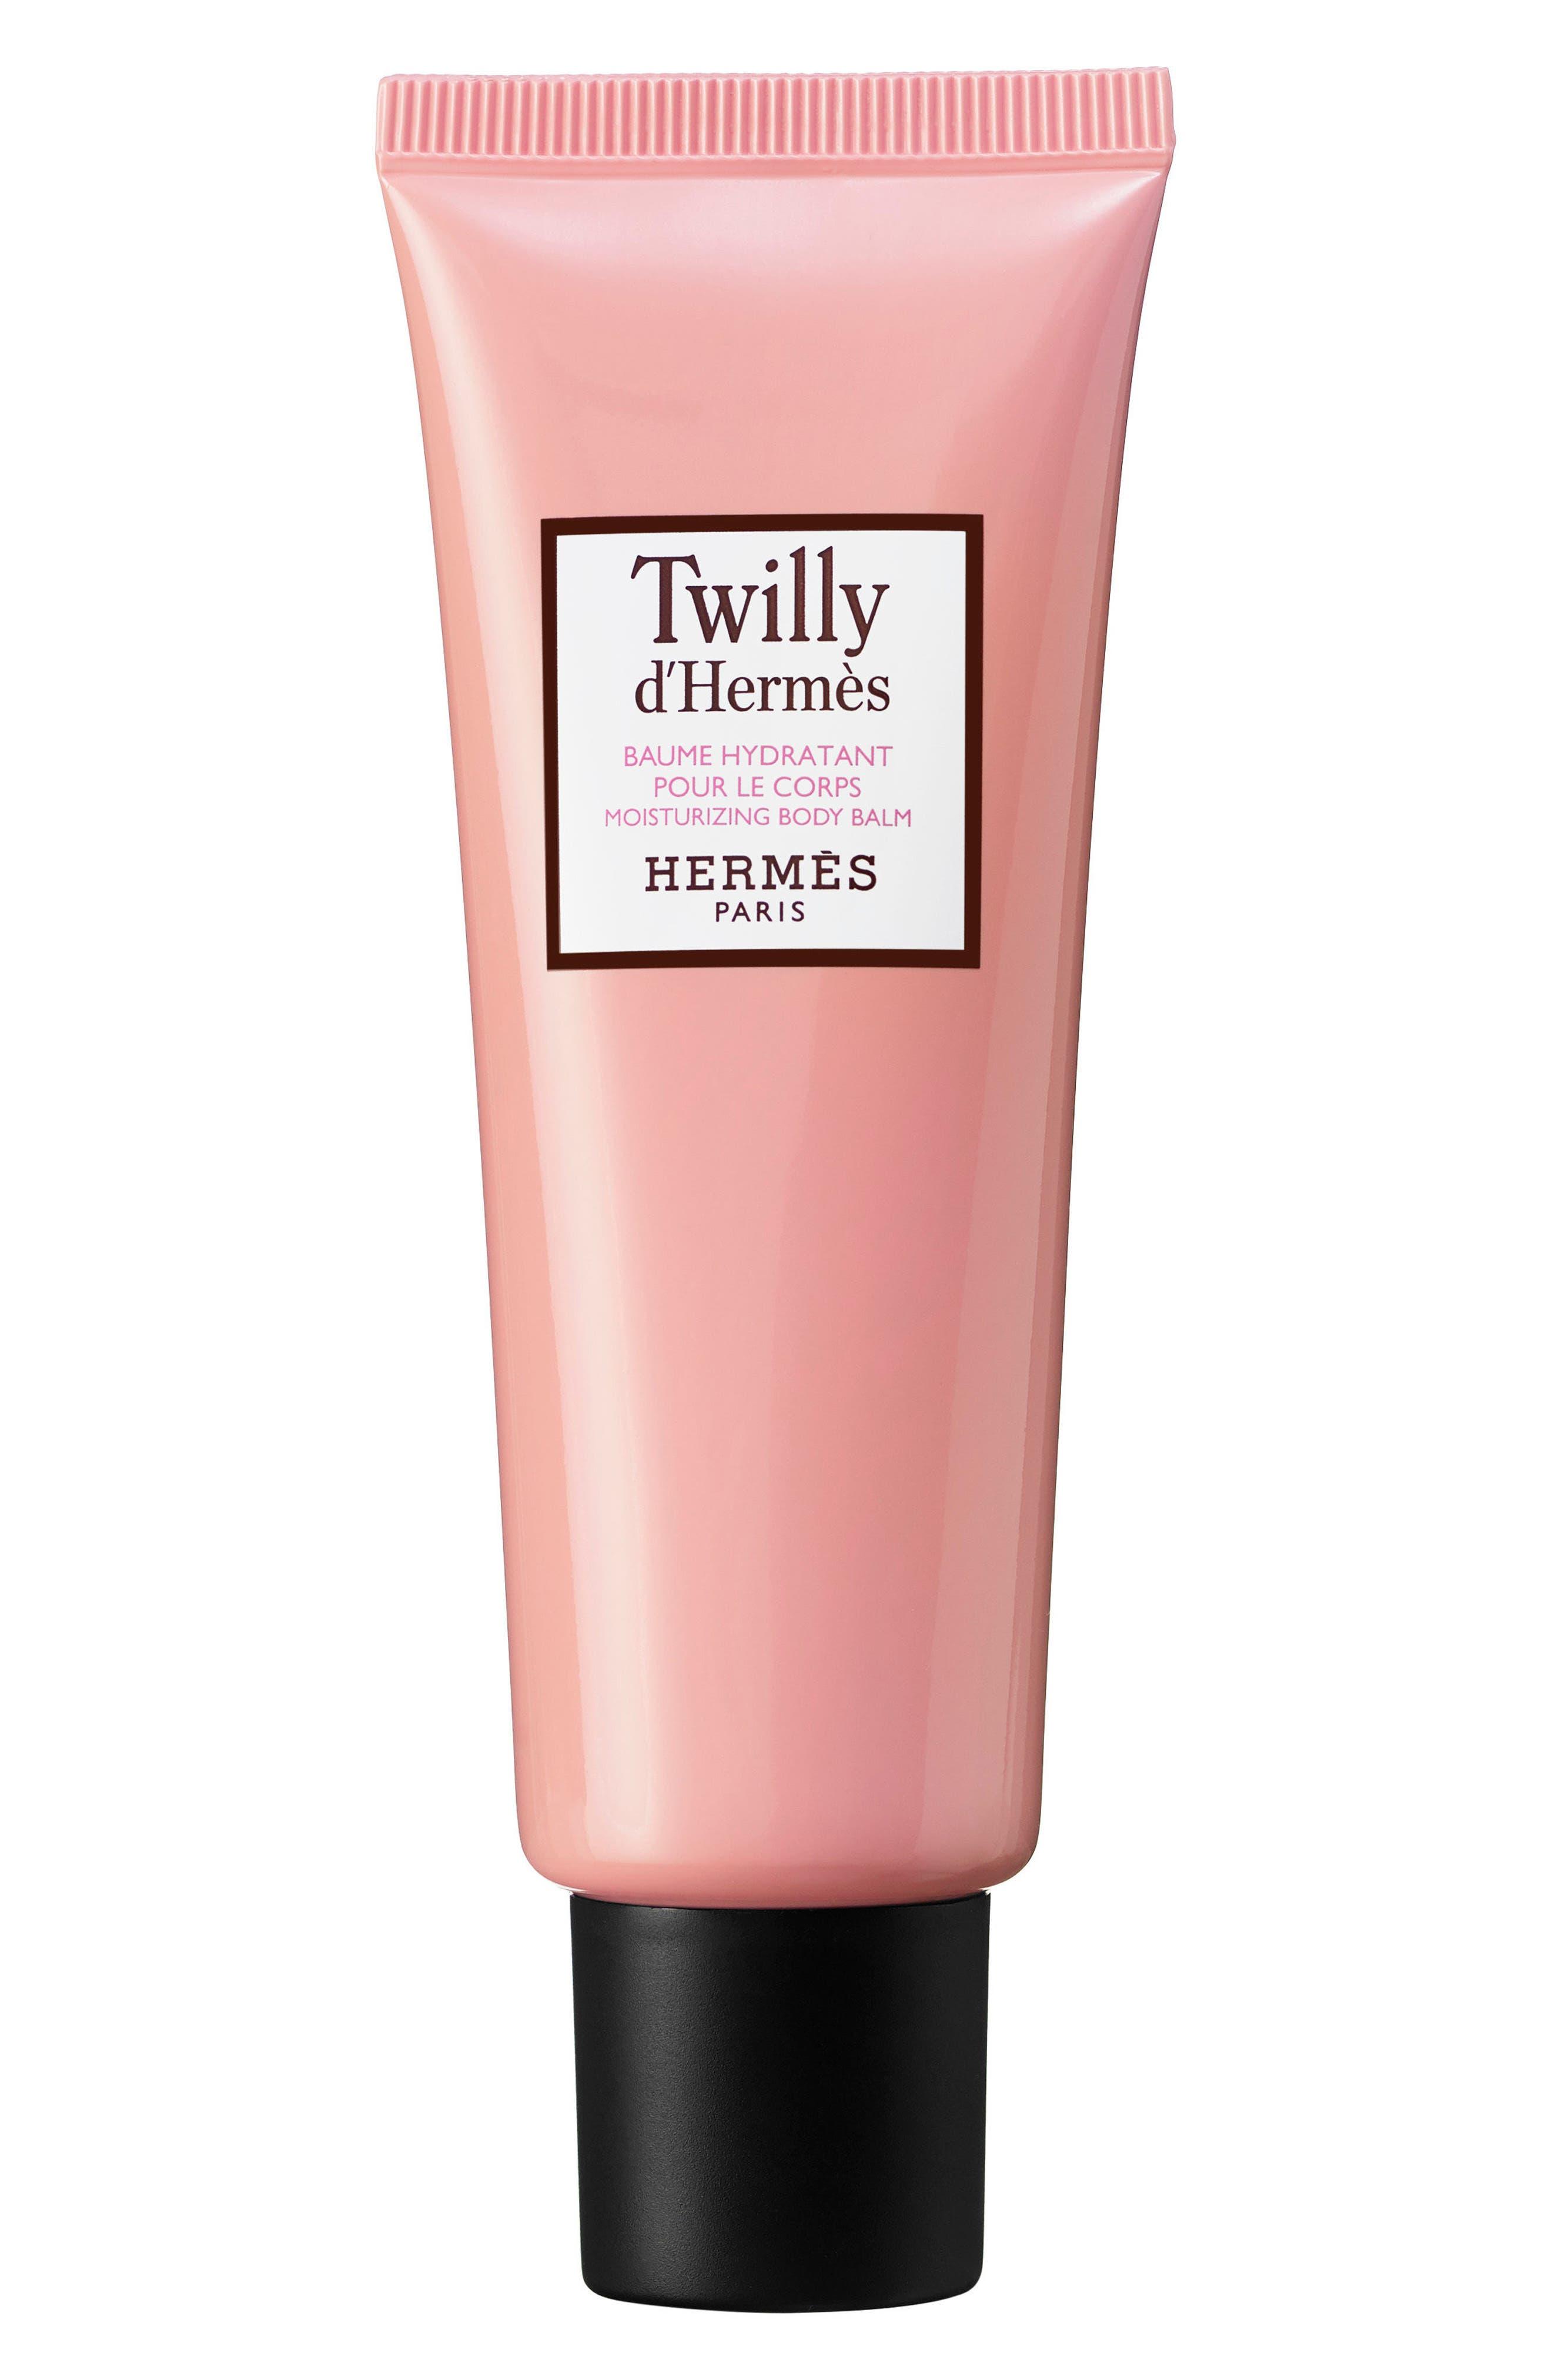 HERMÈS Twilly d'Hermès - Moisturizing body balm, Main, color, NO COLOR